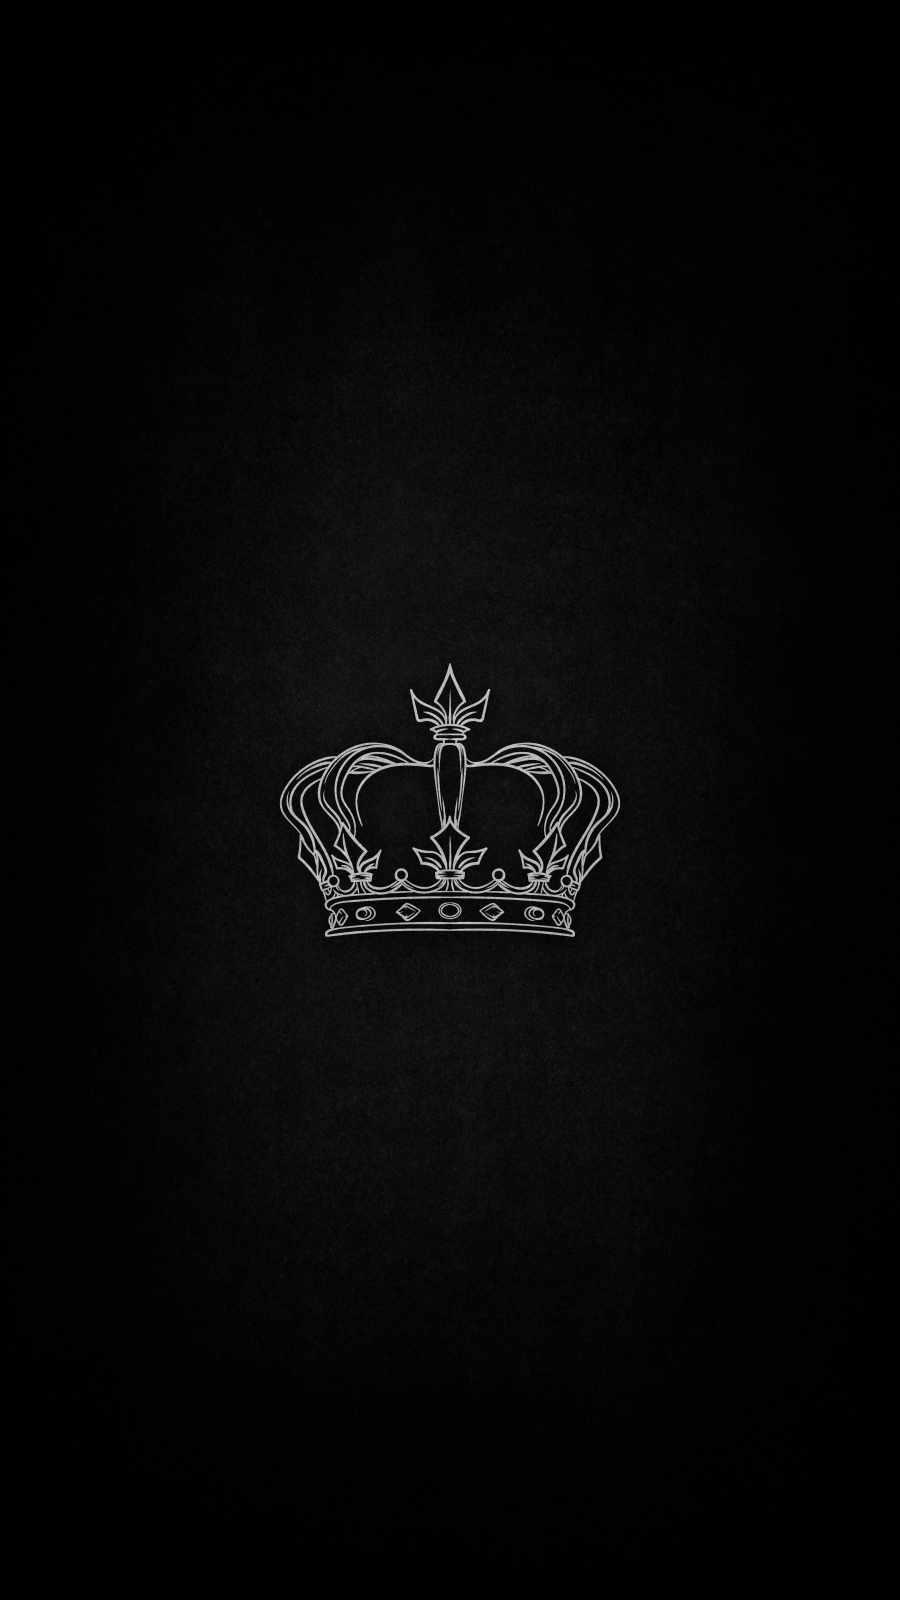 Dark King Crown iPhone Wallpaper